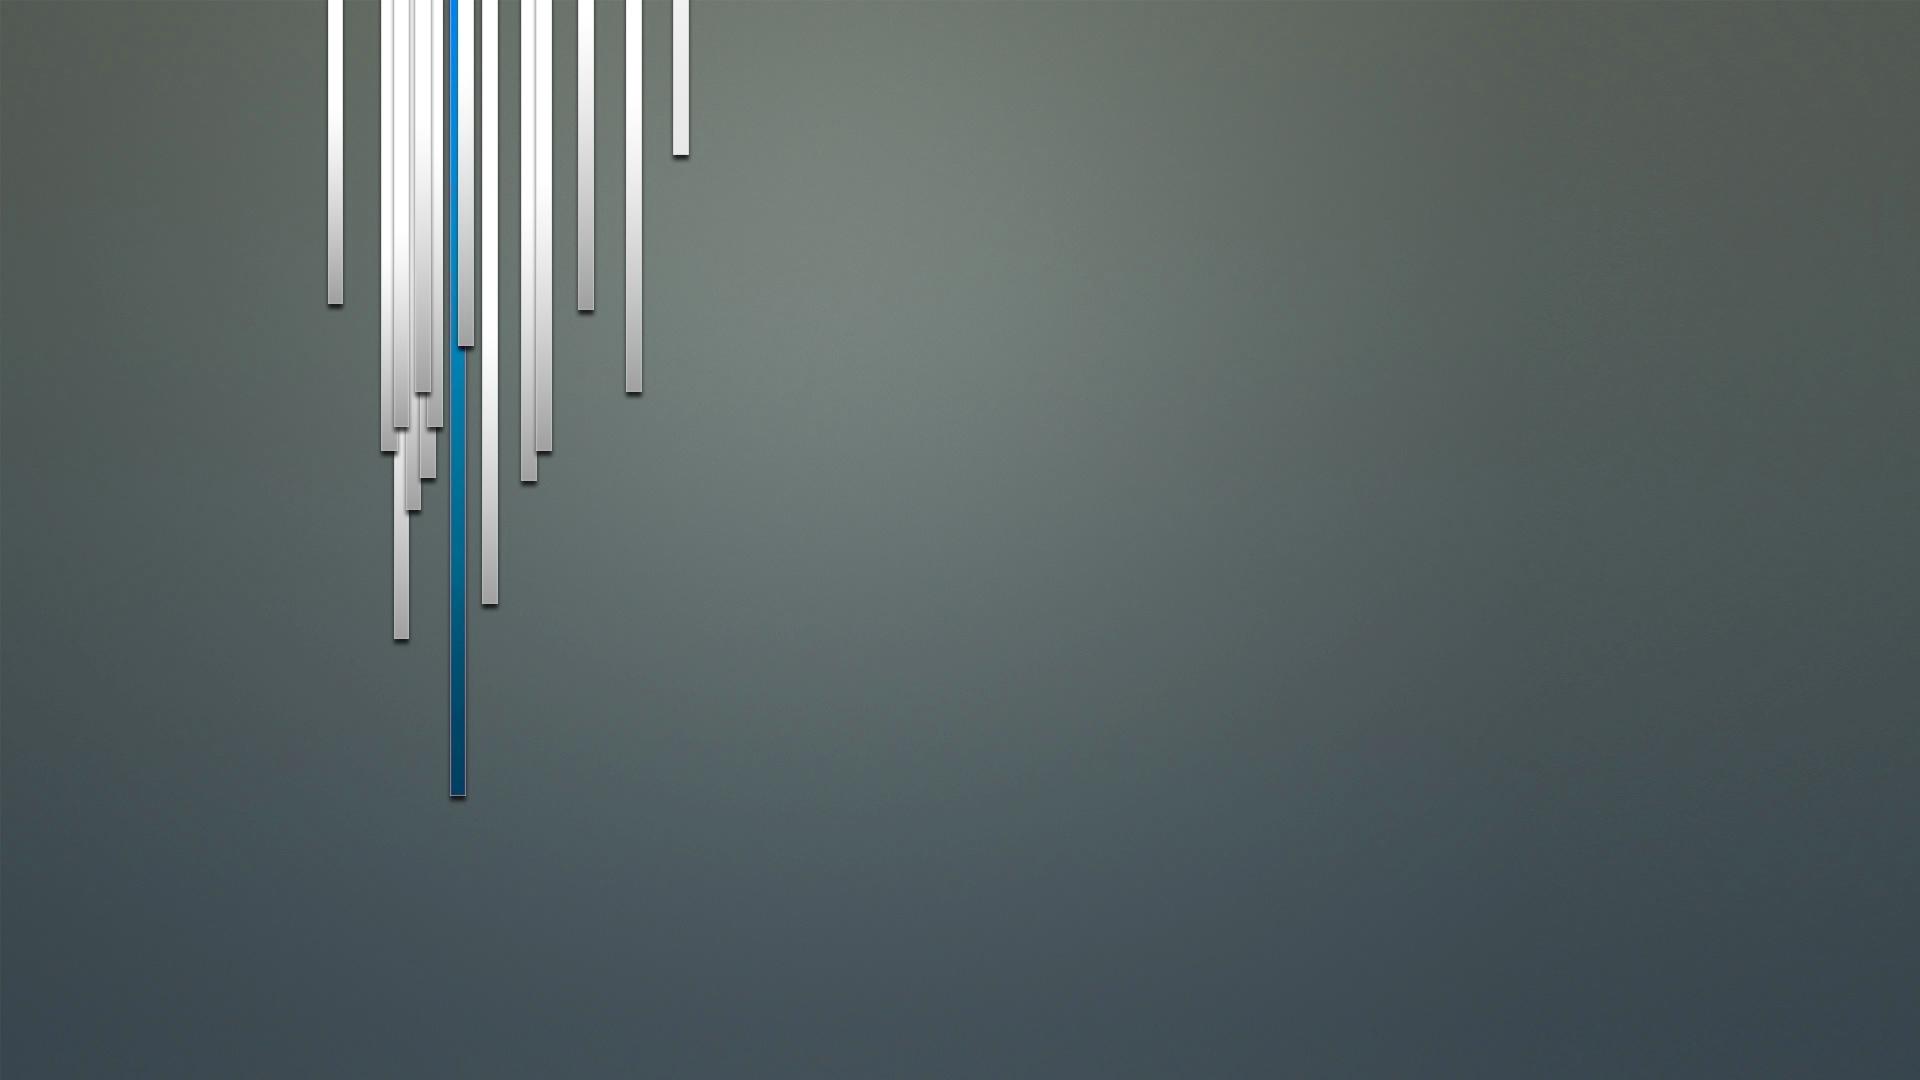 wallpaper white sky blue glass gray angle lighting line